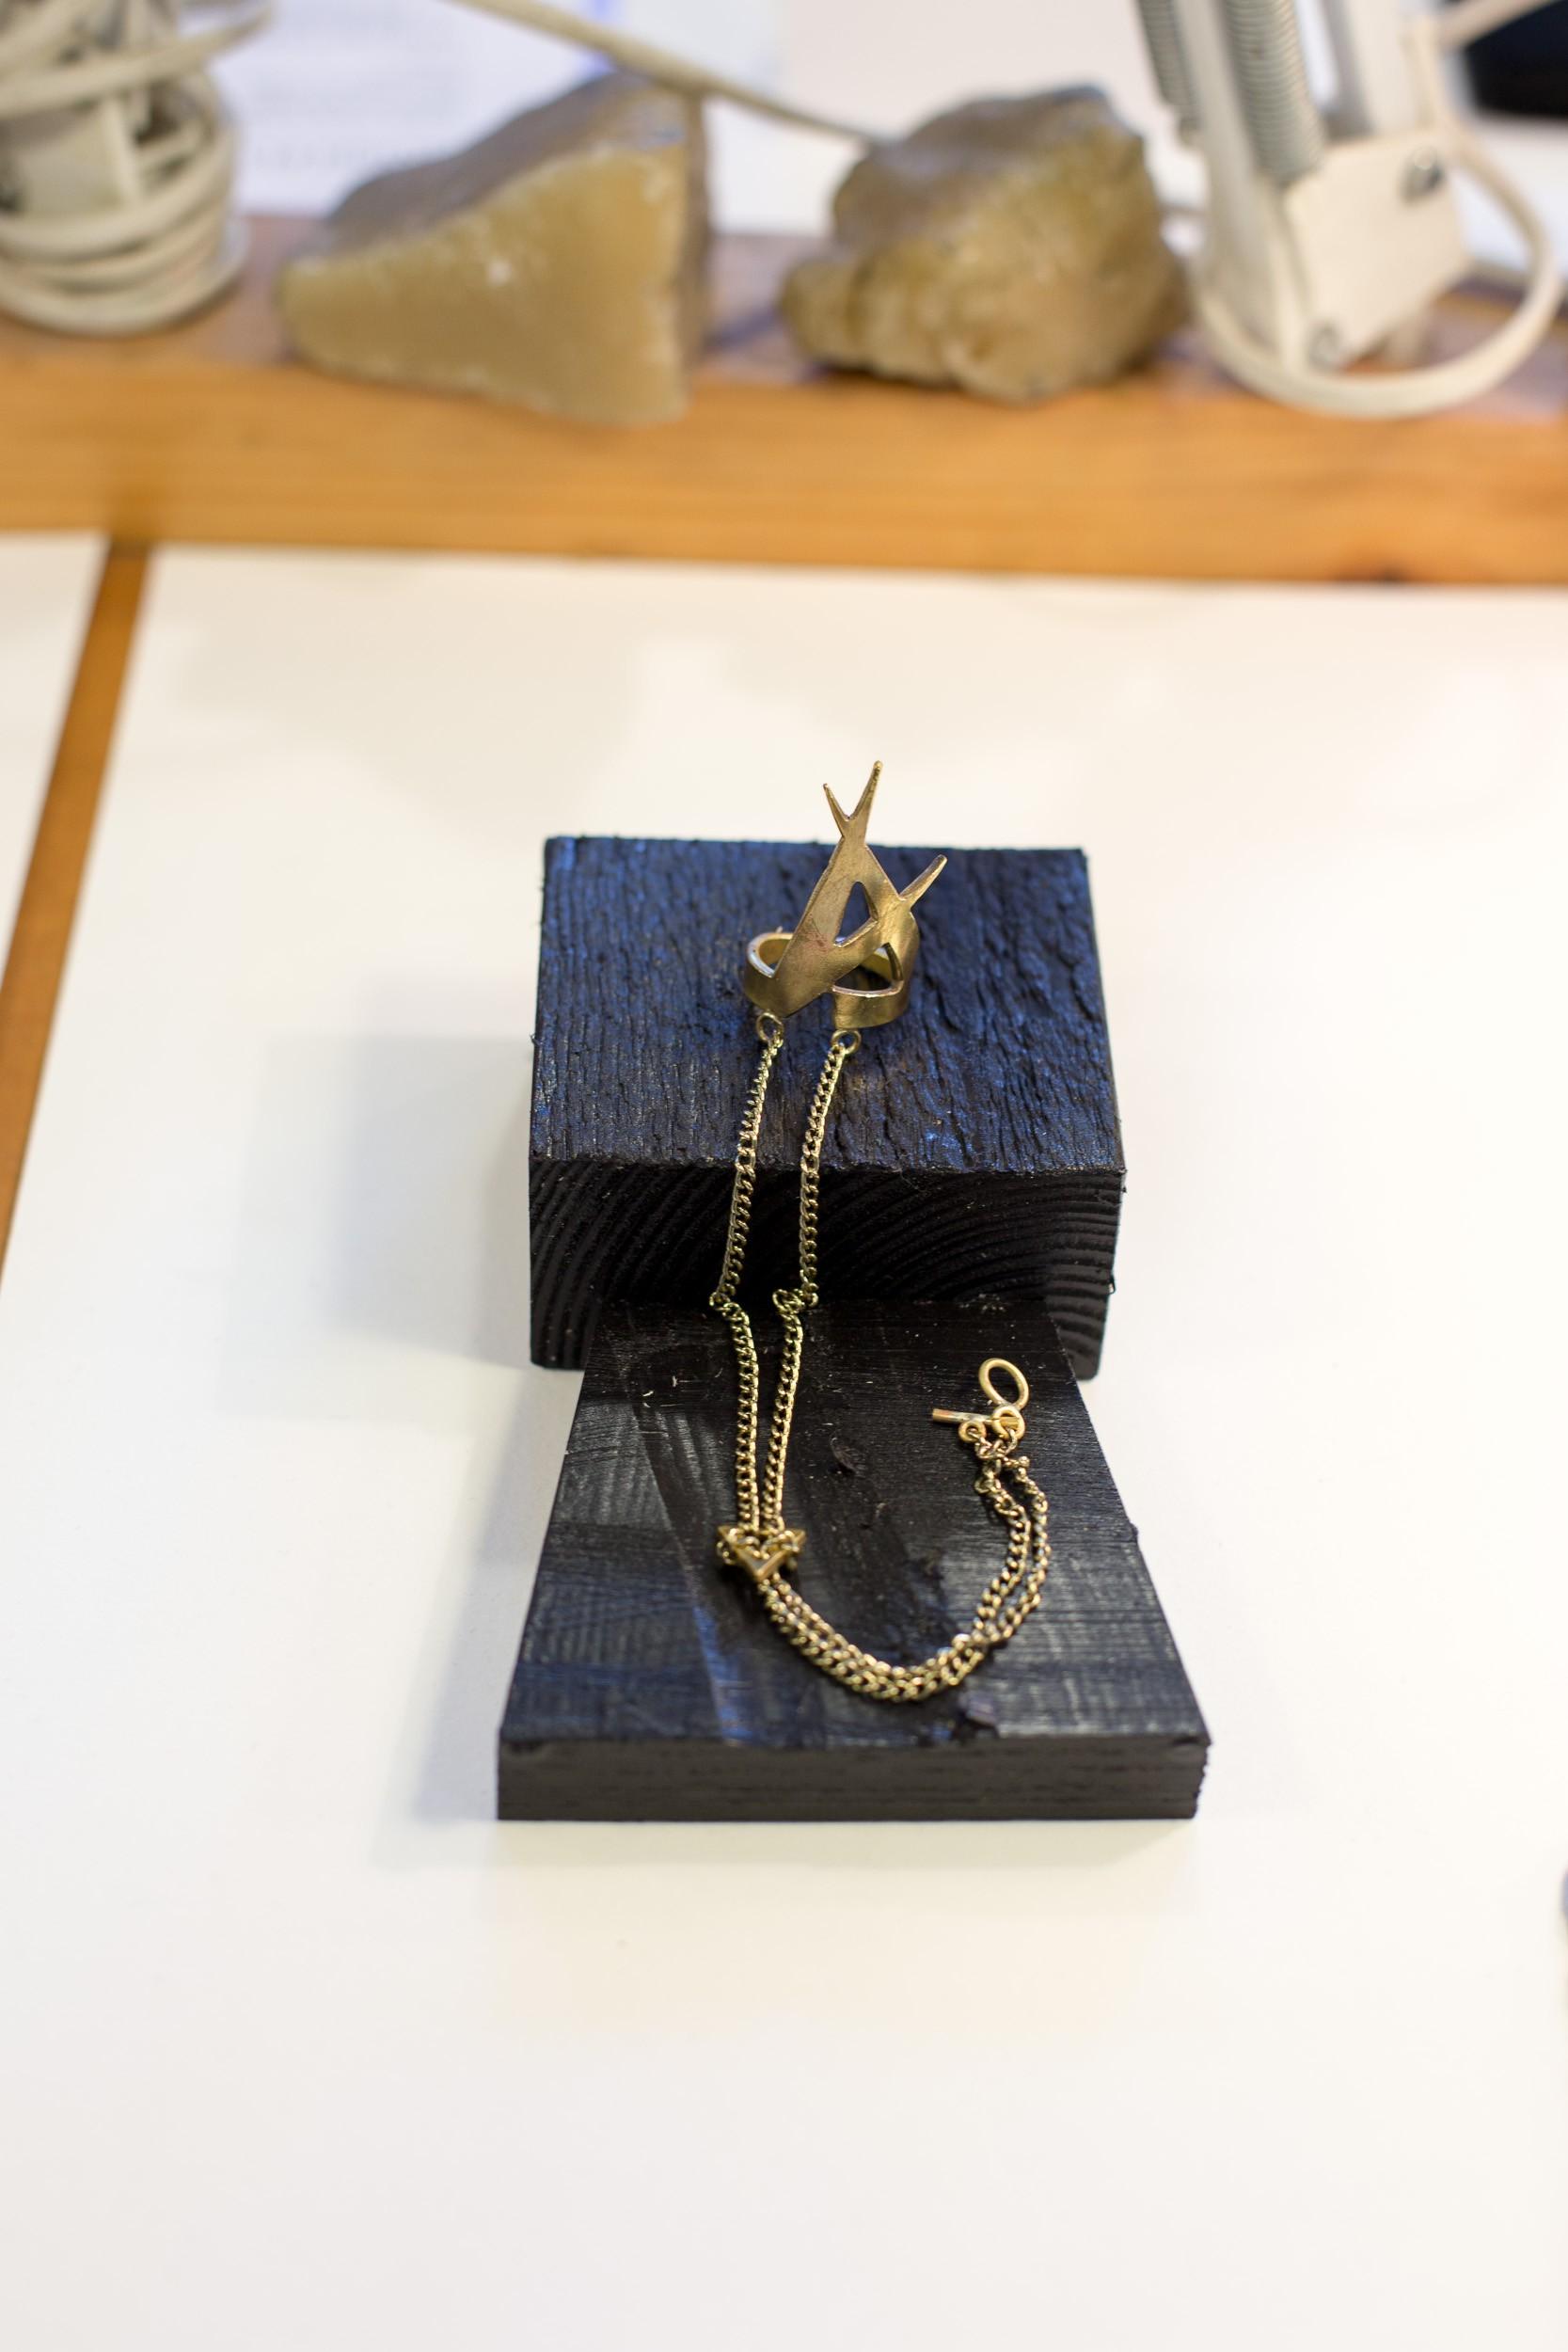 Smykker på Kunsthøjskolen 2014